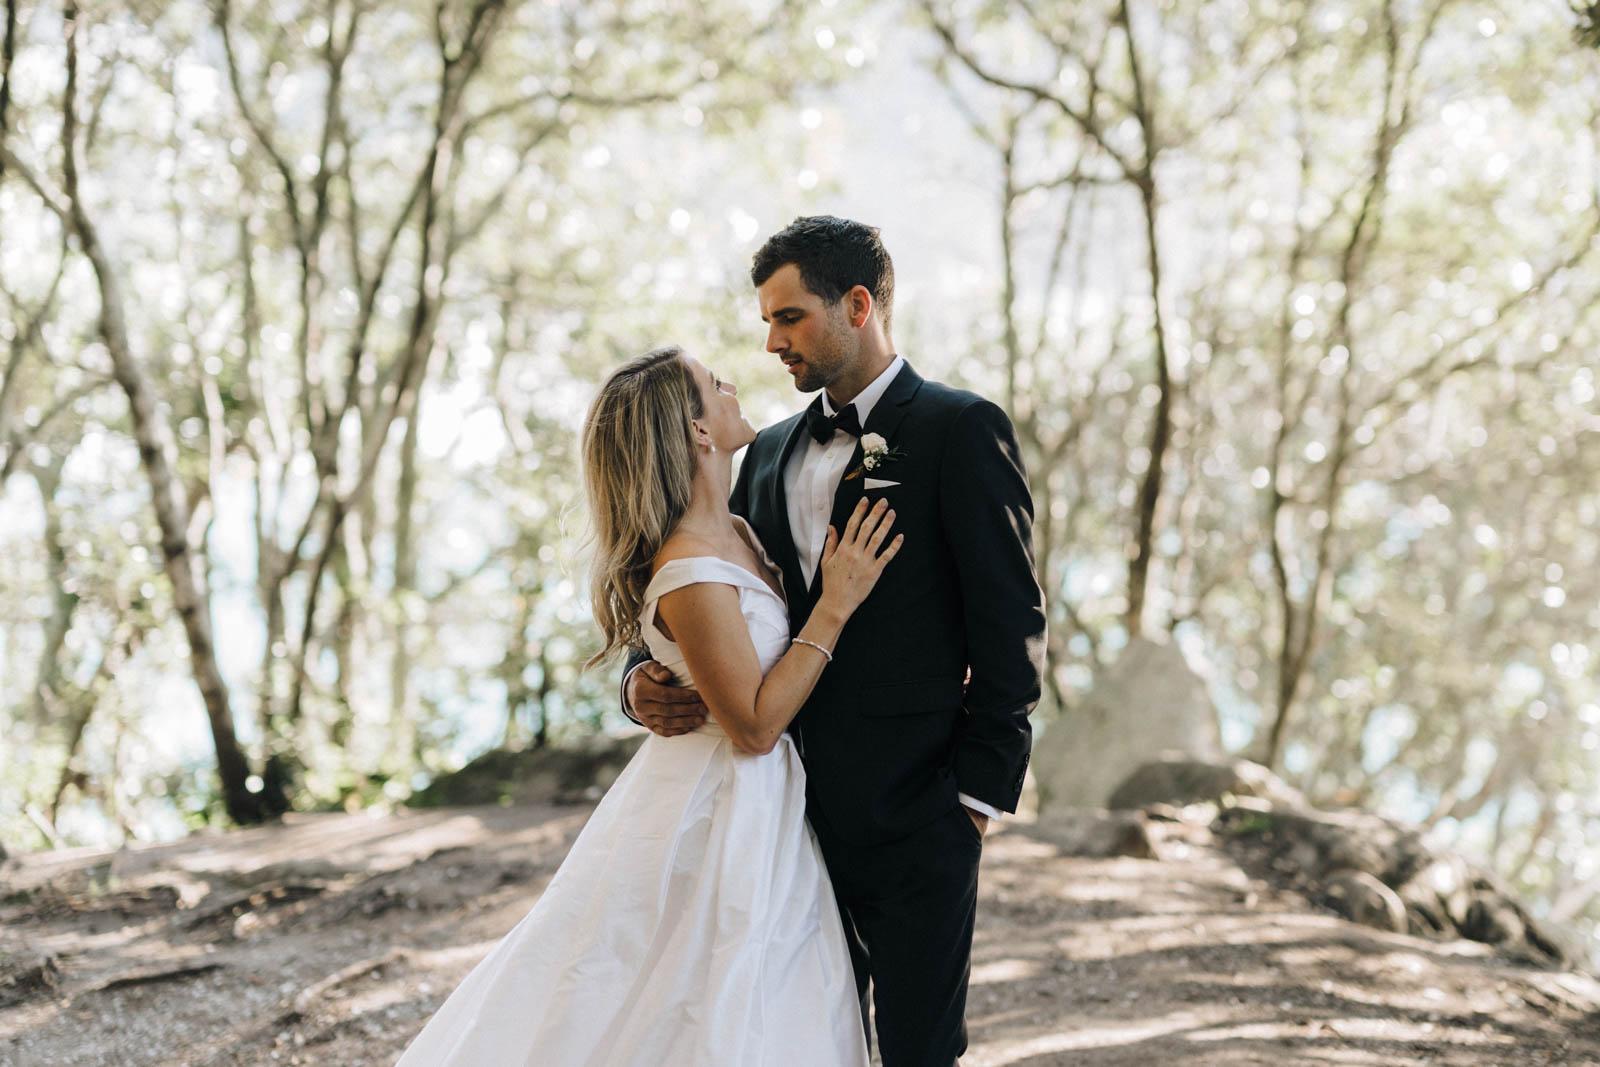 newfound-s-p-mt-maunganui-tauranga-wedding-photographer-1606-A9_05875